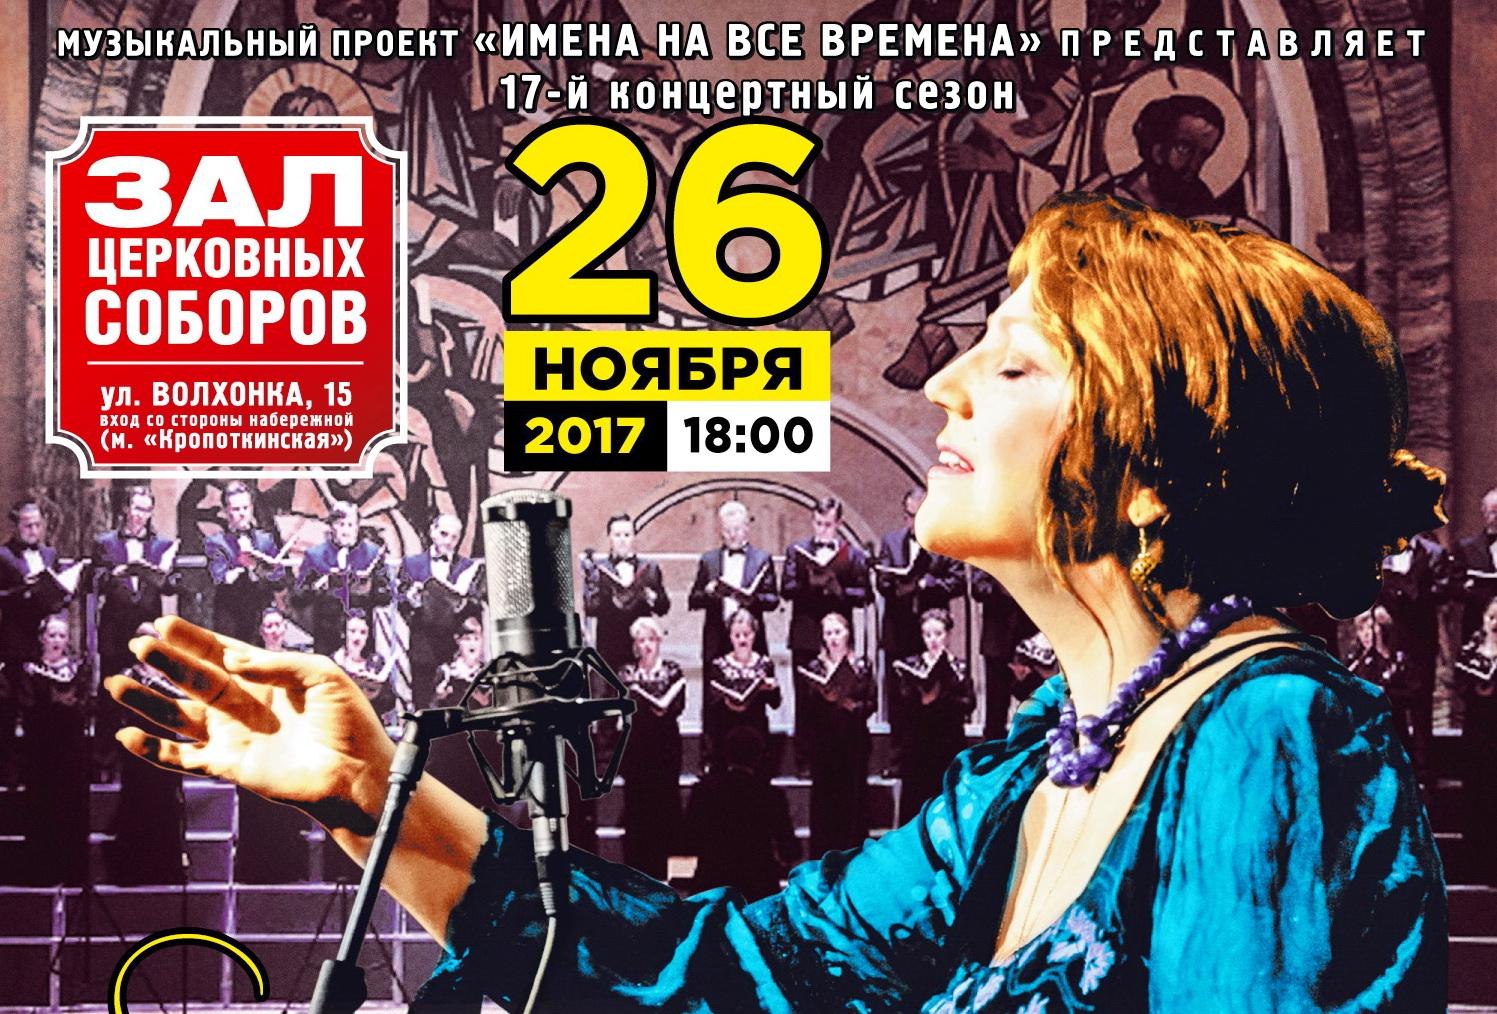 Купить билет на концерт на сайте www.icetickets.ru